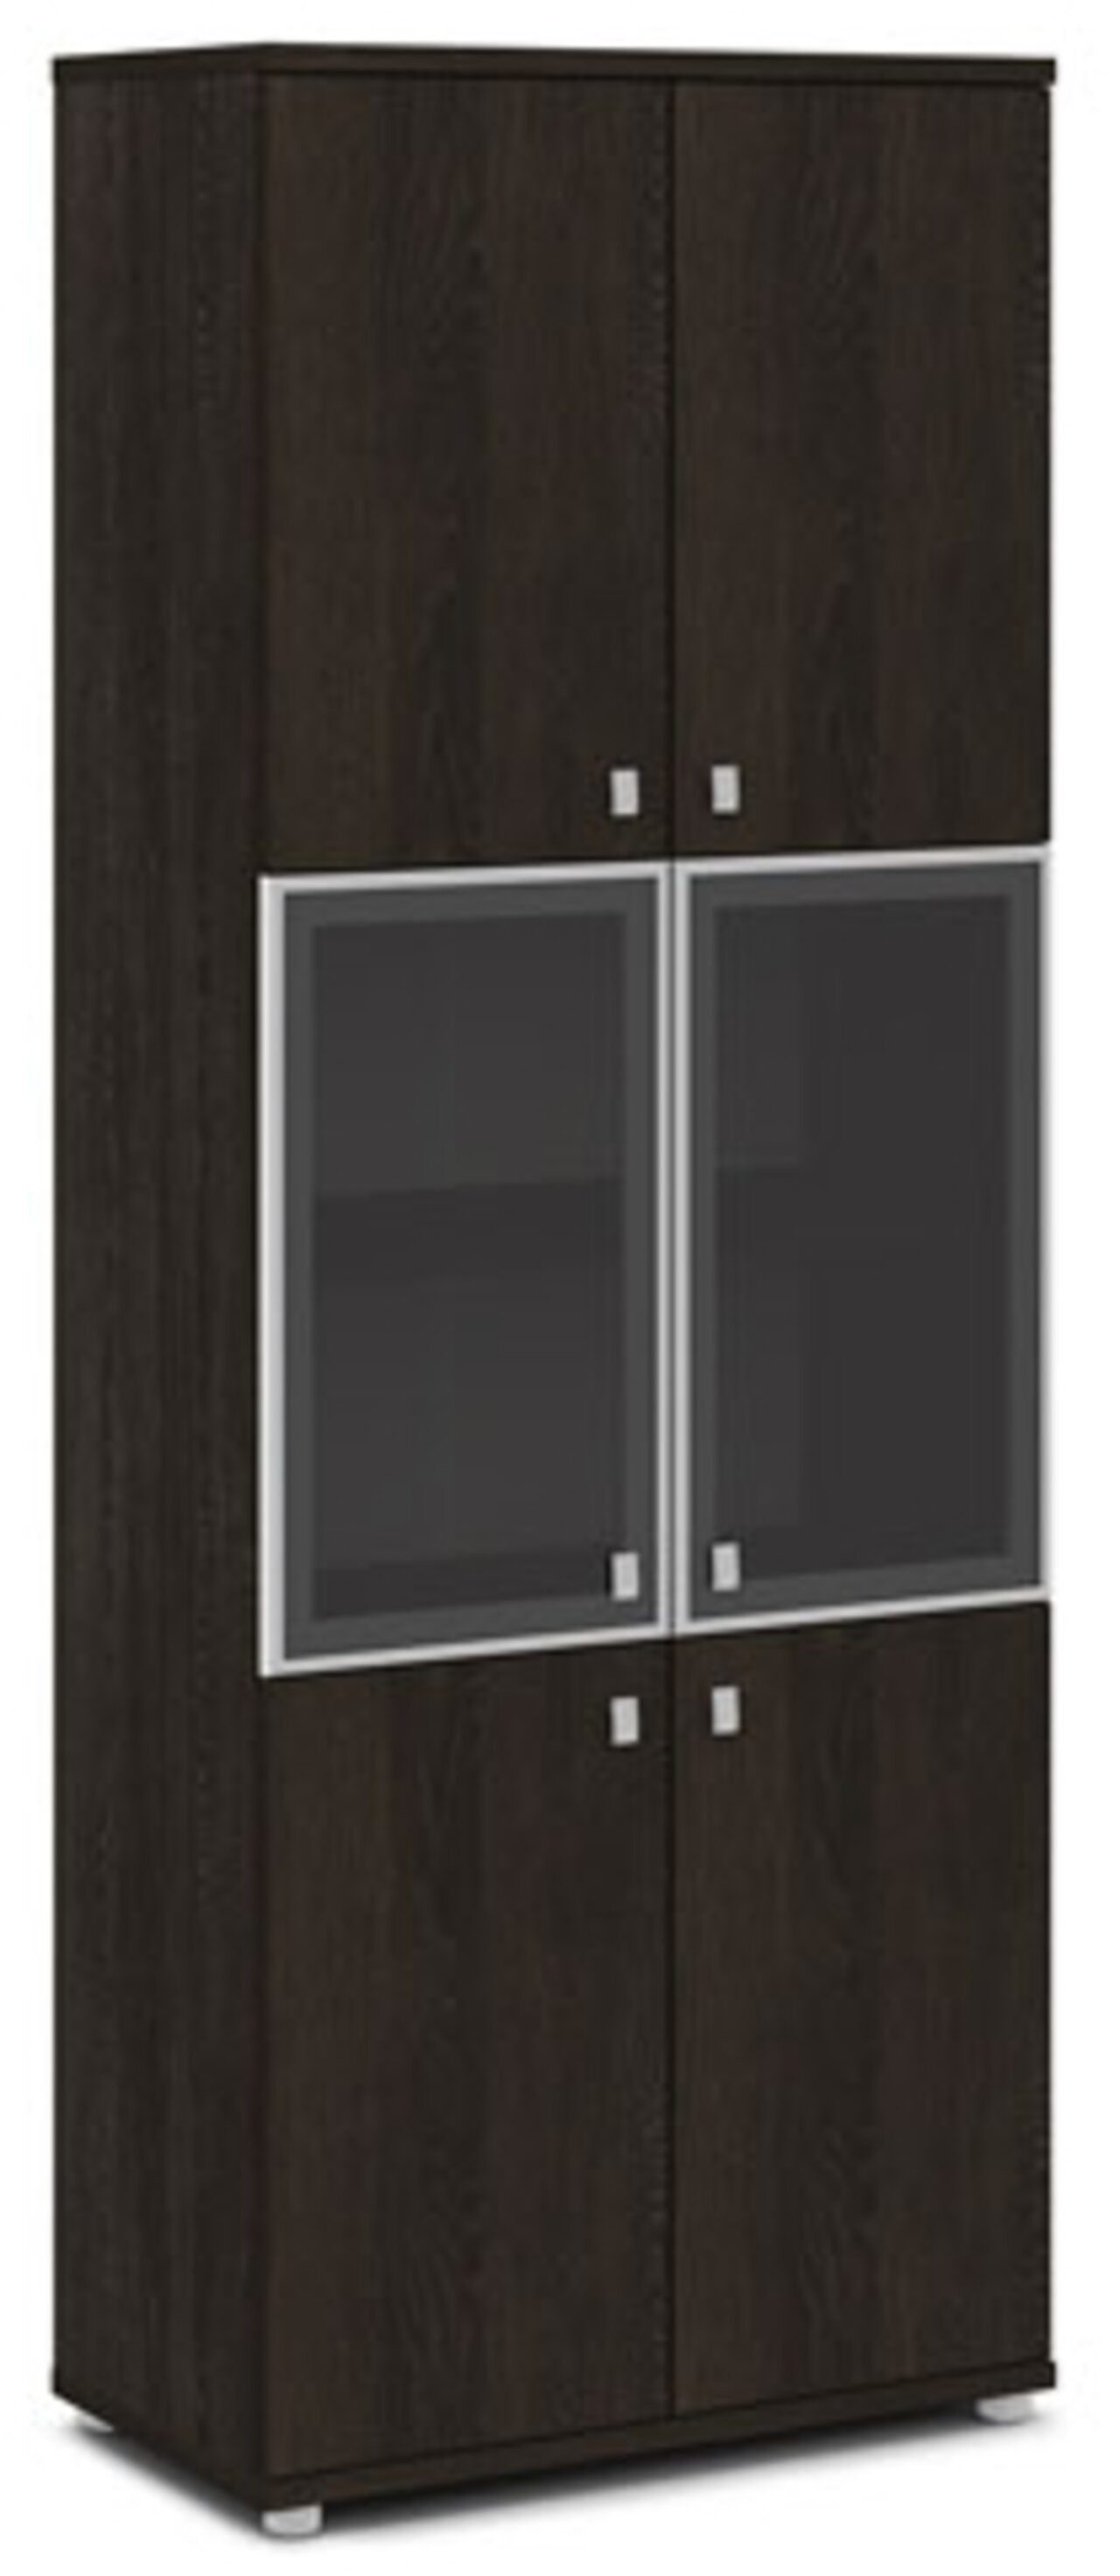 Шкаф со стеклом в алюминиевом профиле  Vasanta 82x44x220 - фото 4